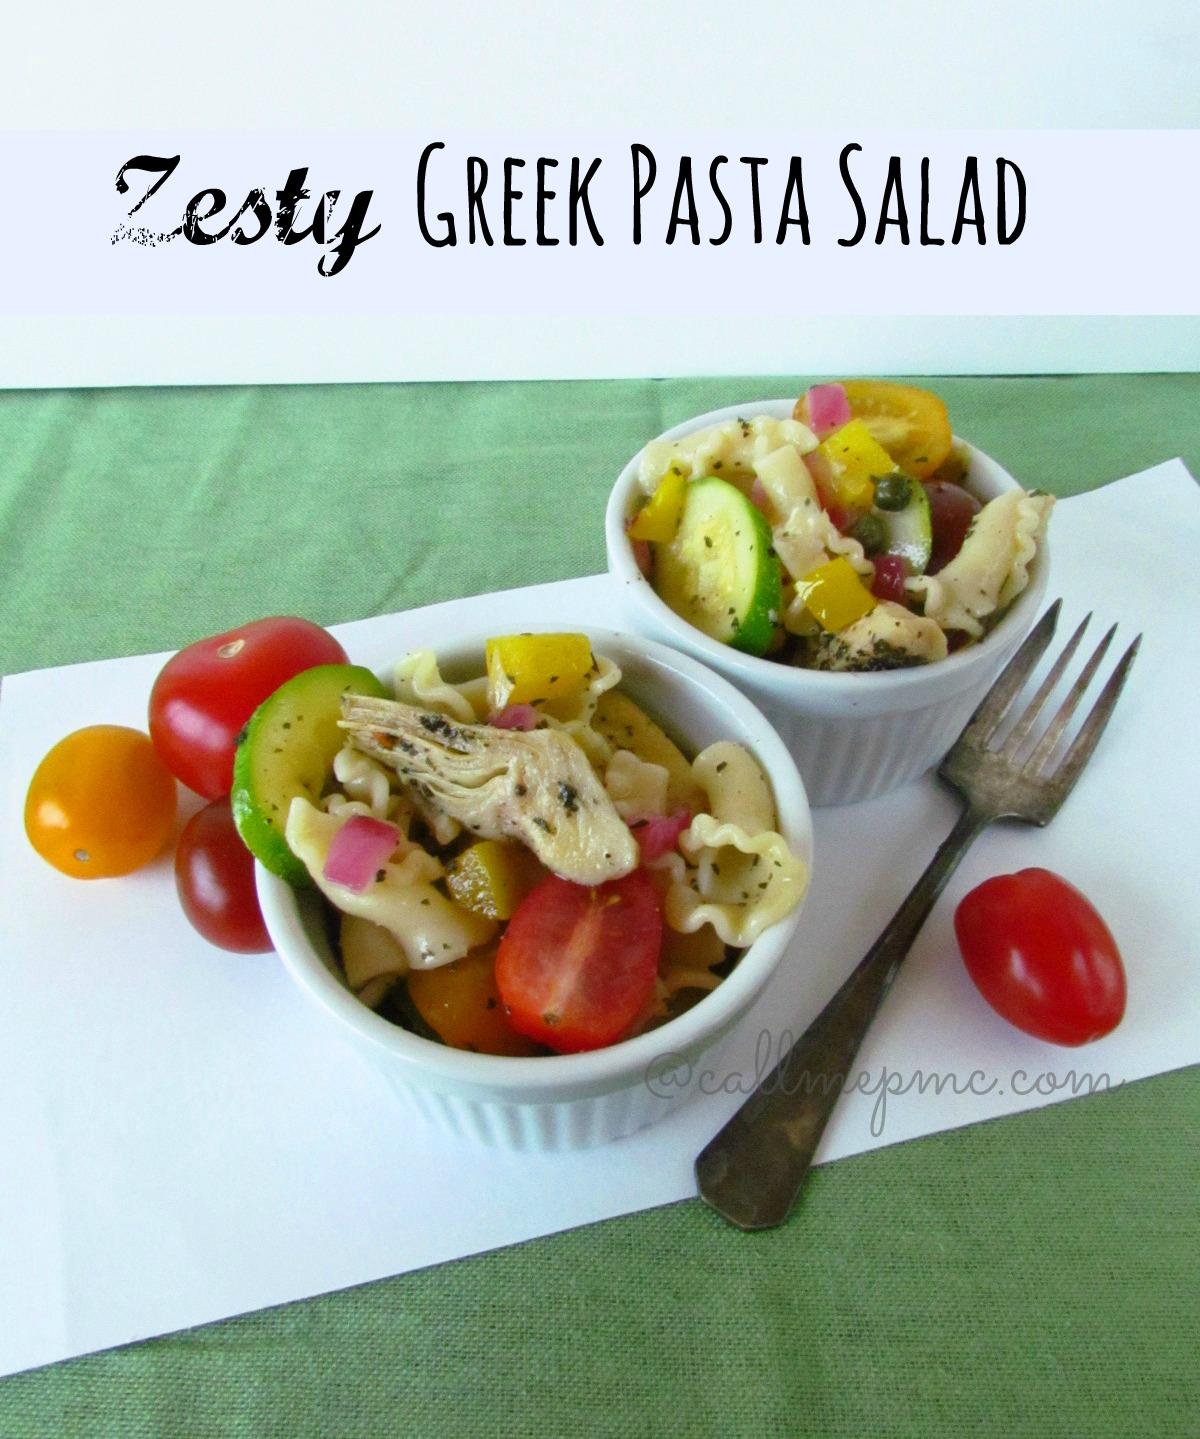 zesty-greek-pasta-salad